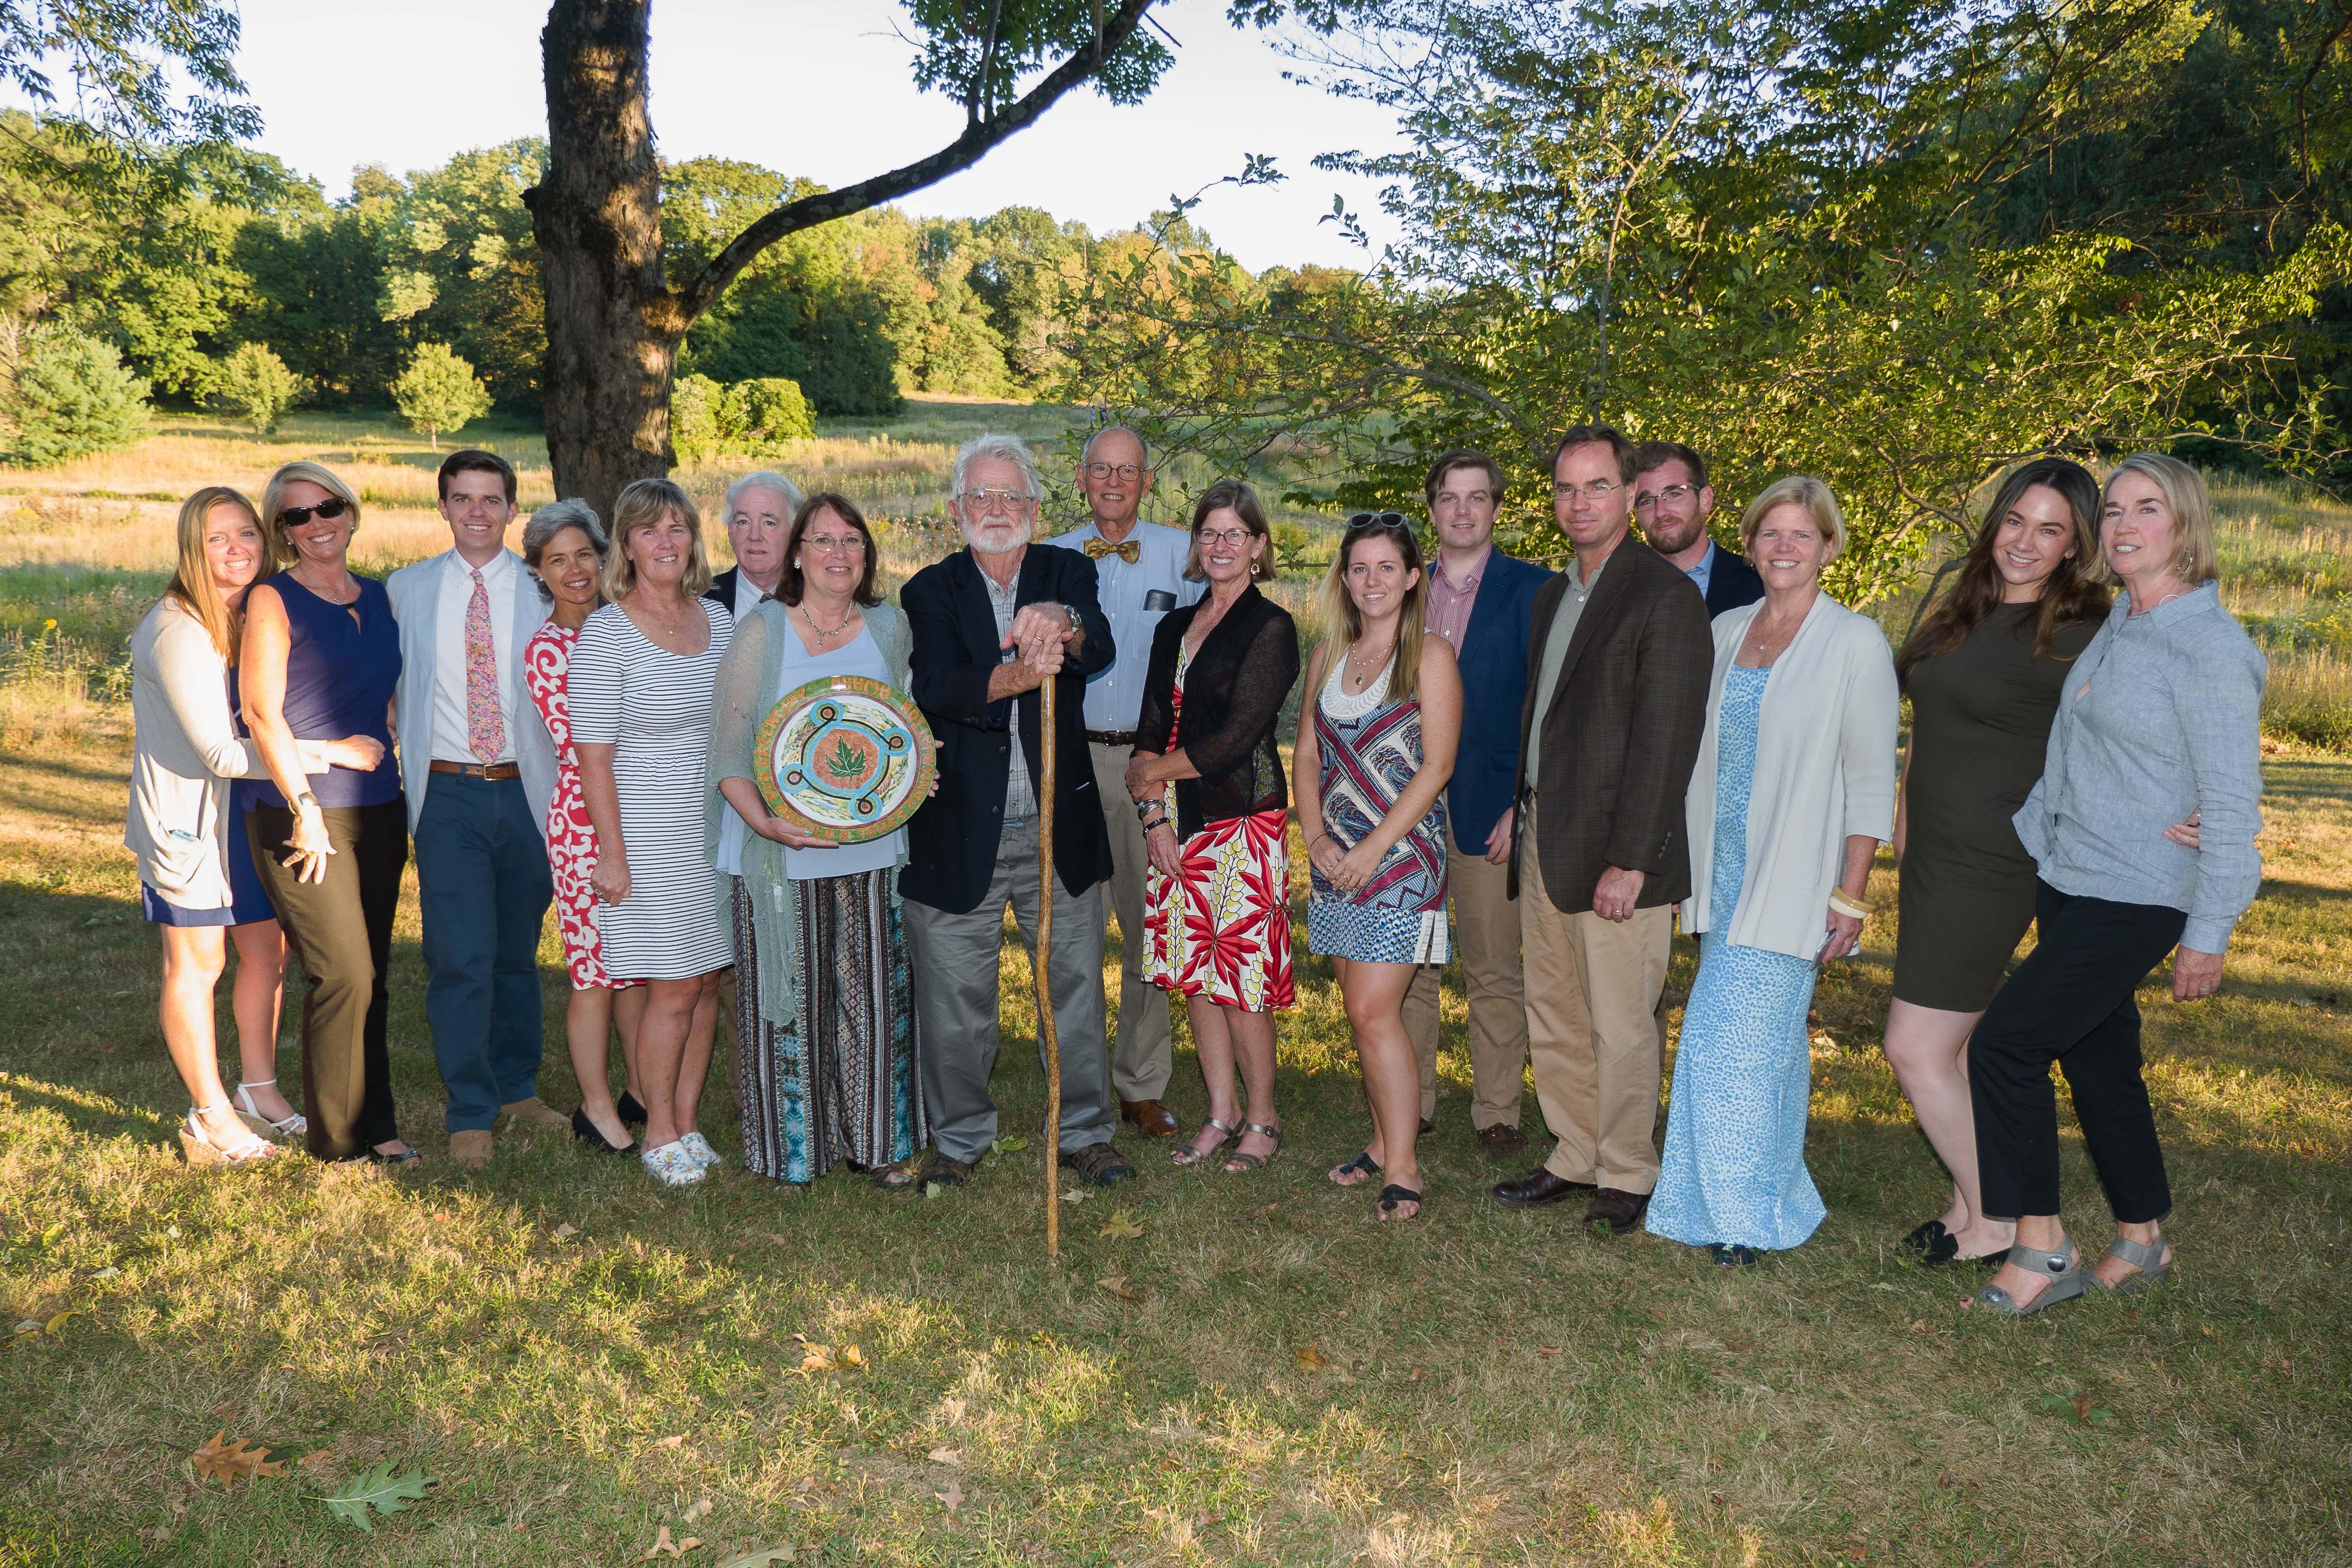 (Carl Geisler) Linda Mead, David Blair and family with award